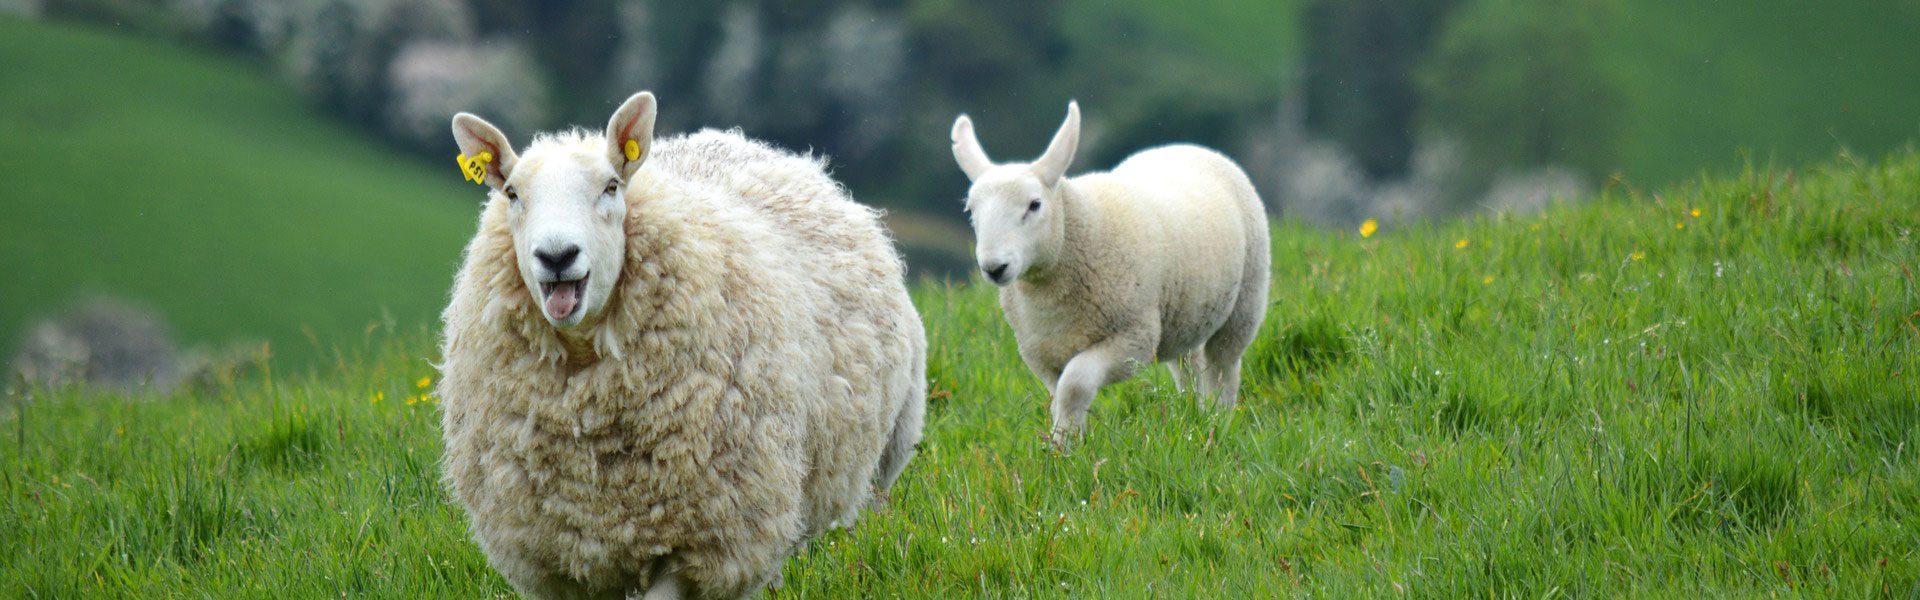 sheep1_1920_opt